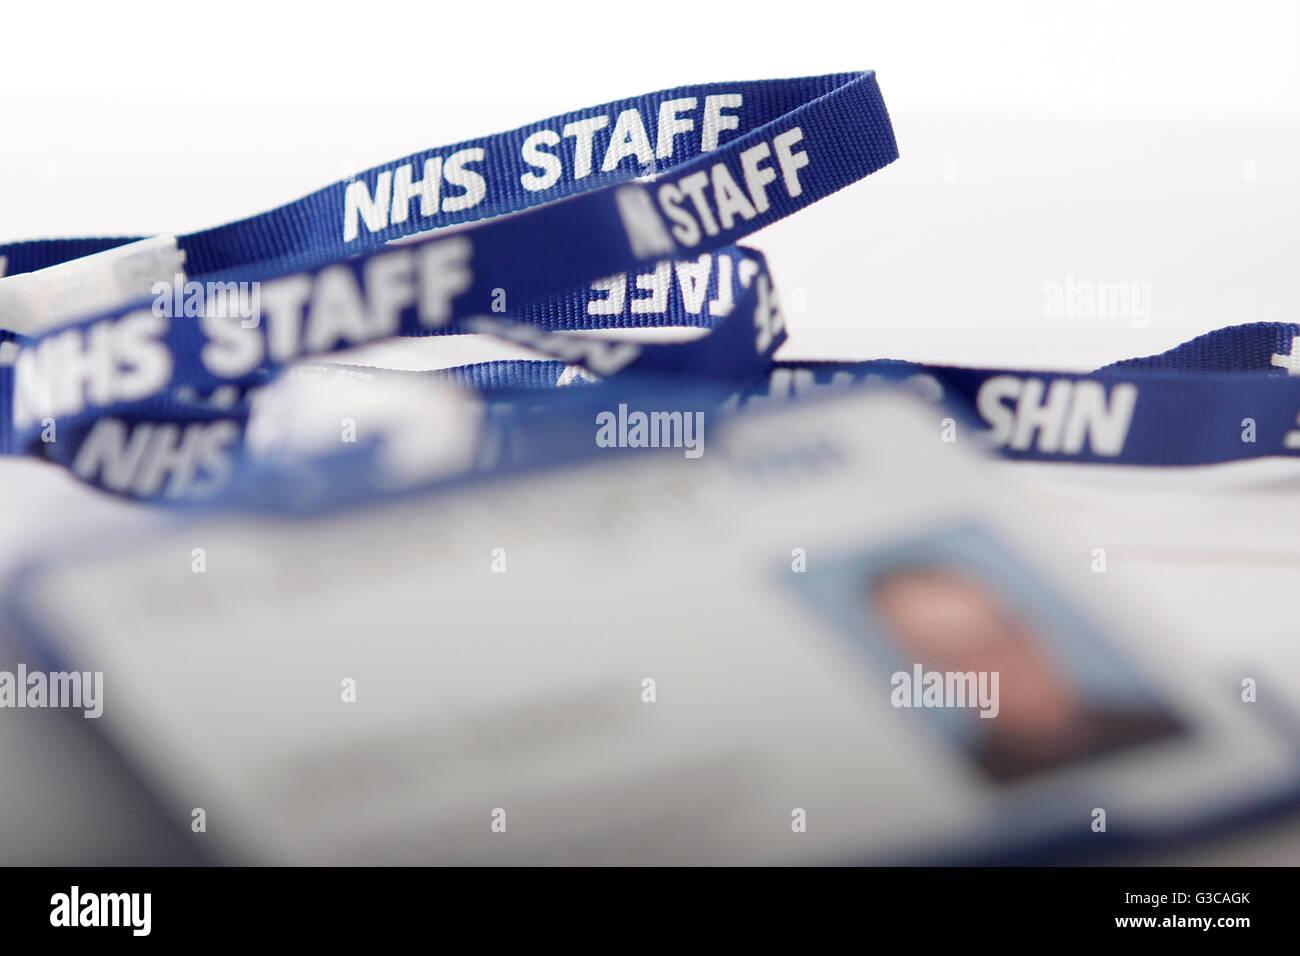 NHS staff employee badge - Stock Image